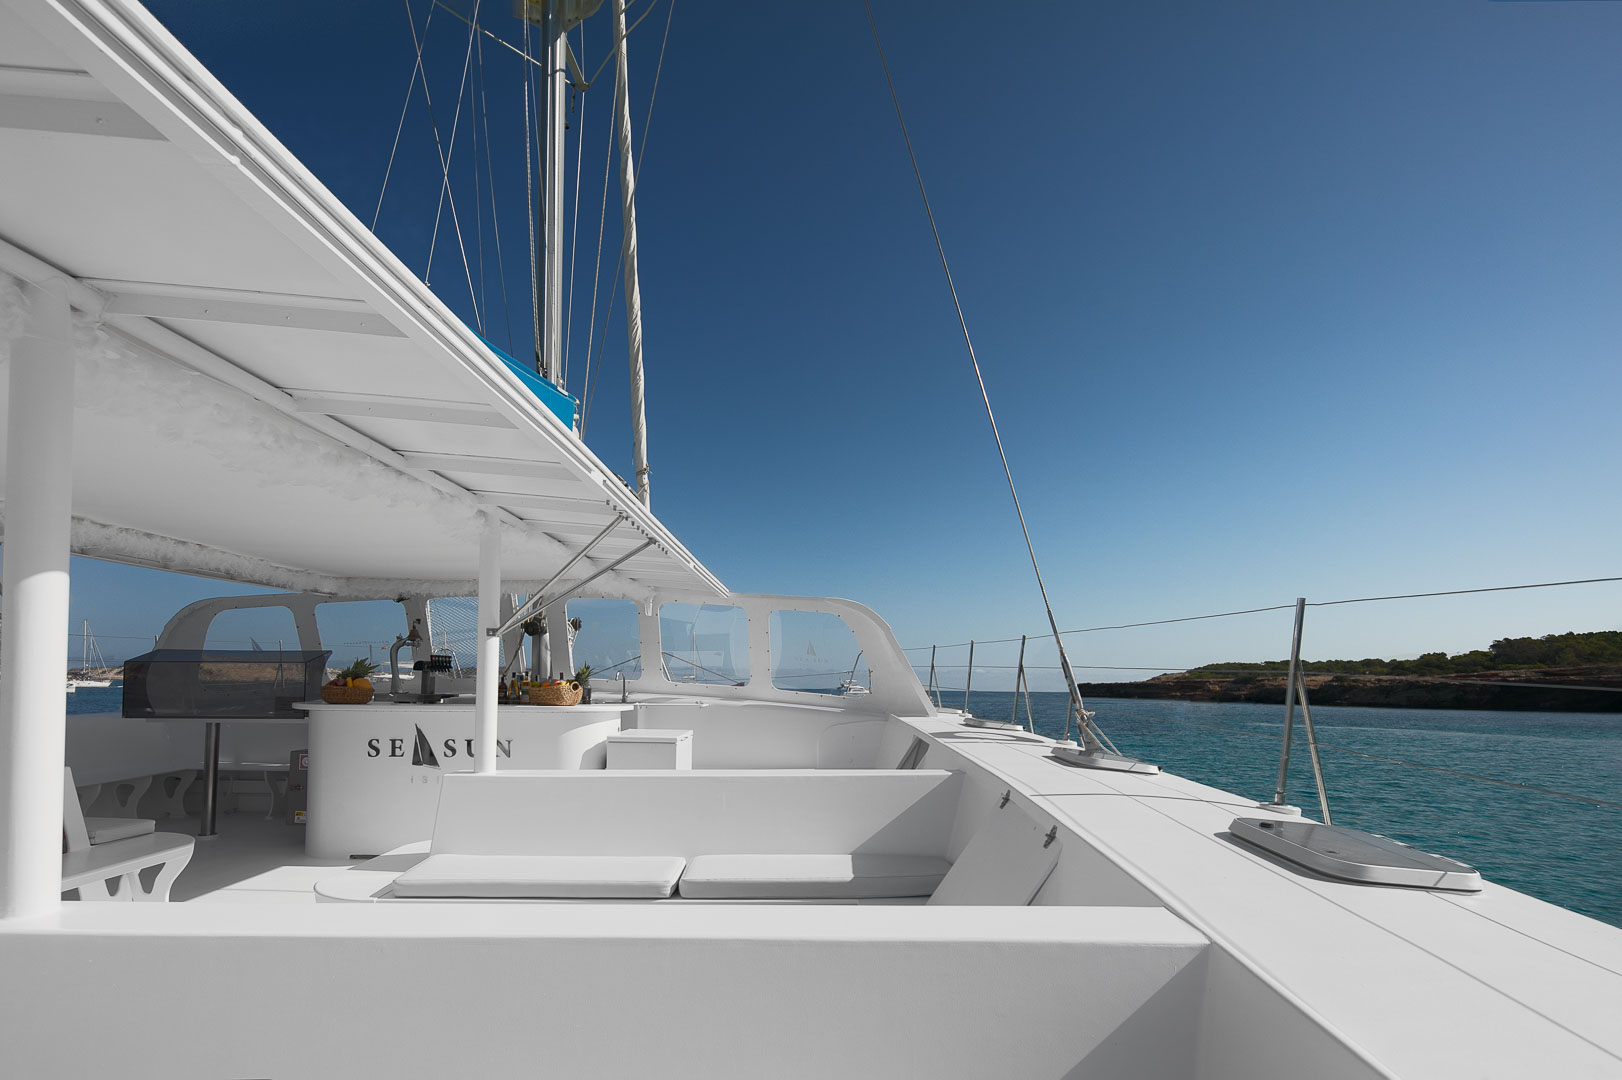 fotografia profesional publicitaria del exterior de un catamaran para pasajeros en ibiza